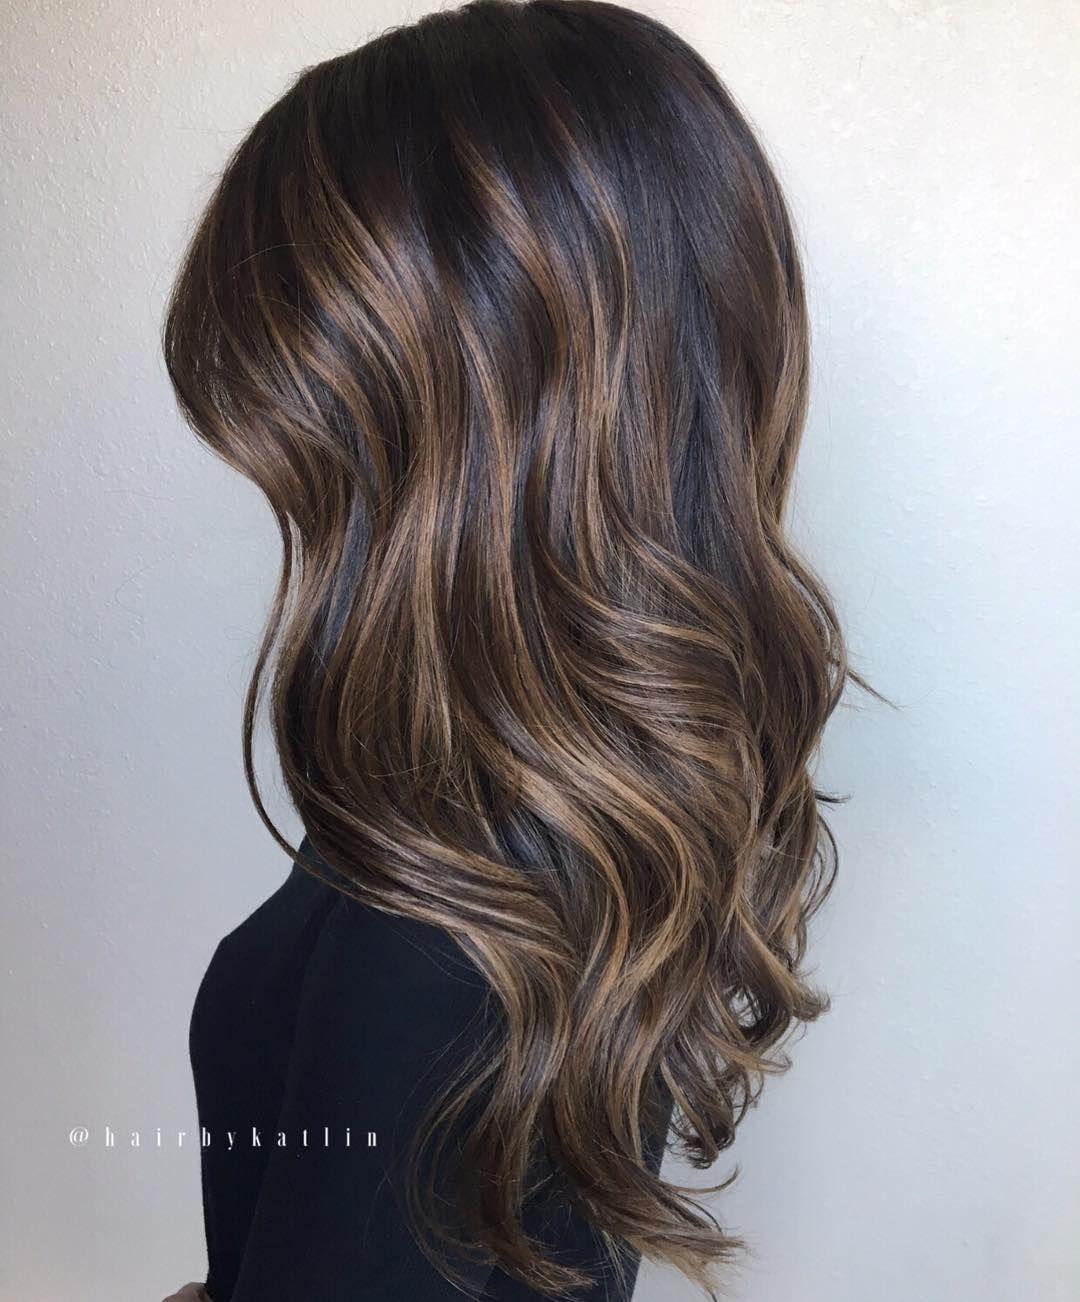 Balayage Vs Foil Hilights Winter Blonde Hair Balayage Hair Painting